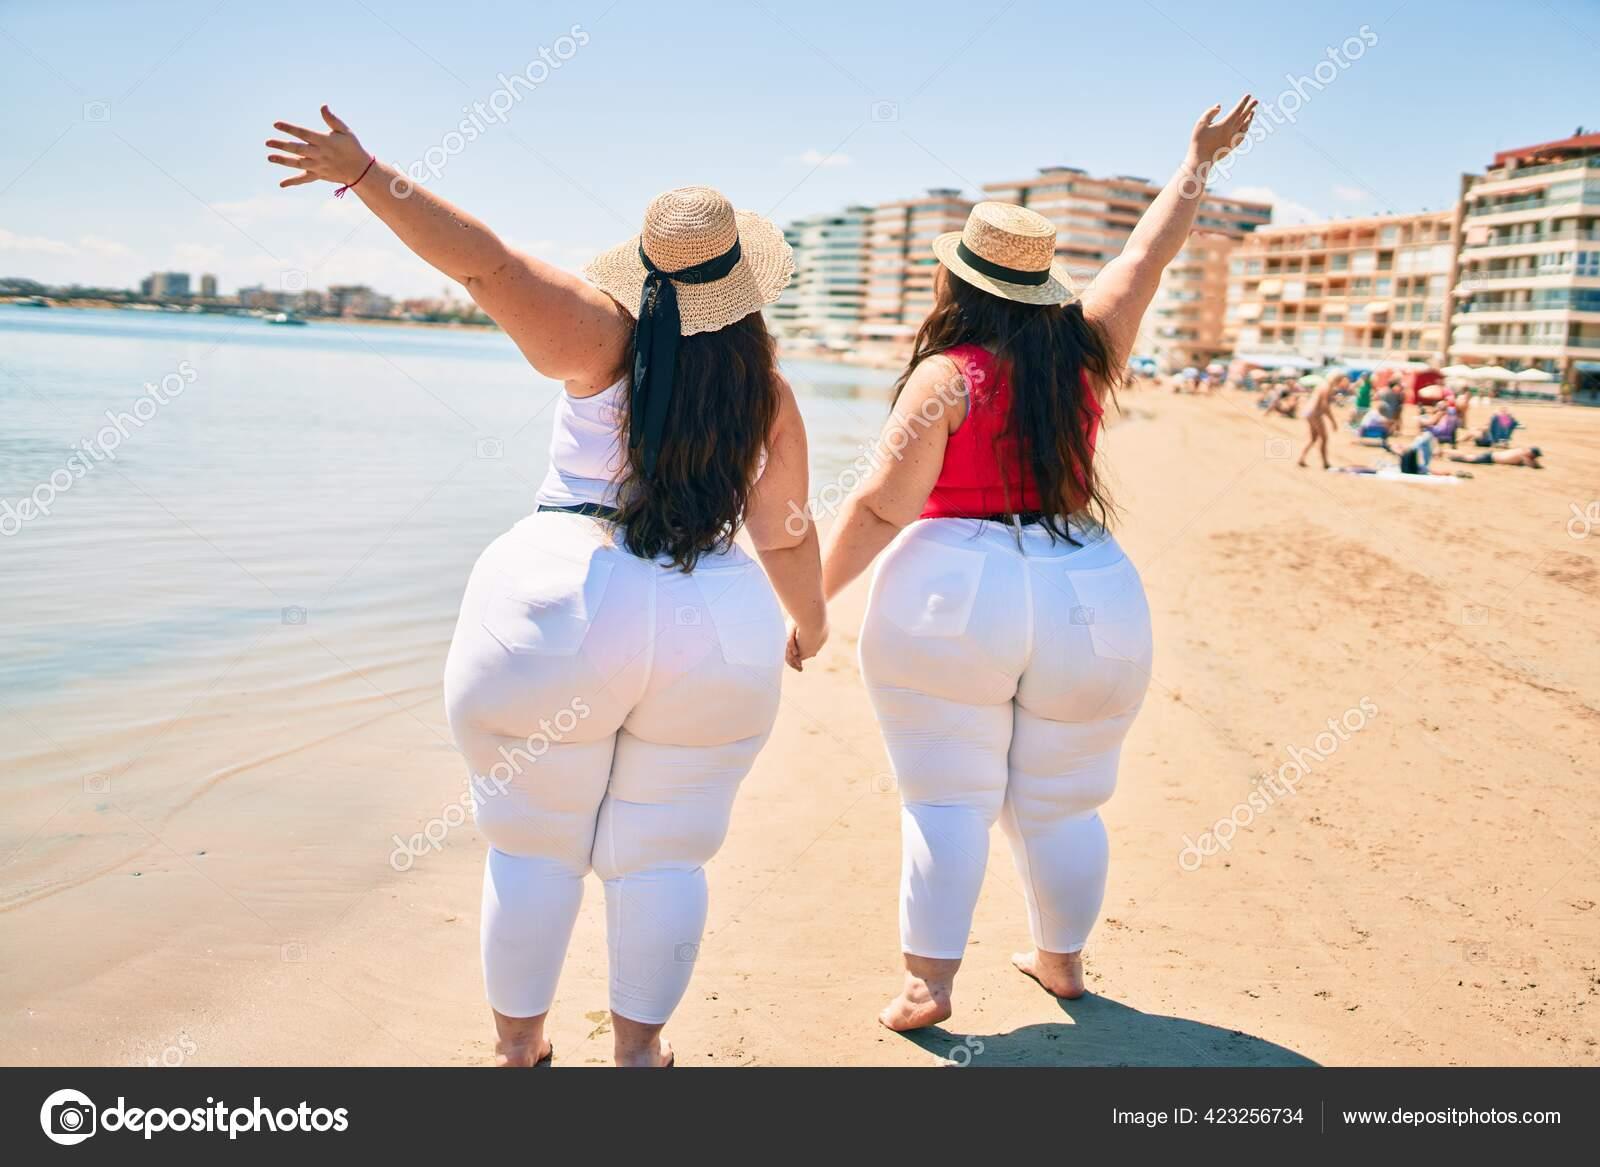 Busty chubby teen 136 Chubby Girls Belly Stock Photos Free Royalty Free Chubby Girls Belly Images Depositphotos